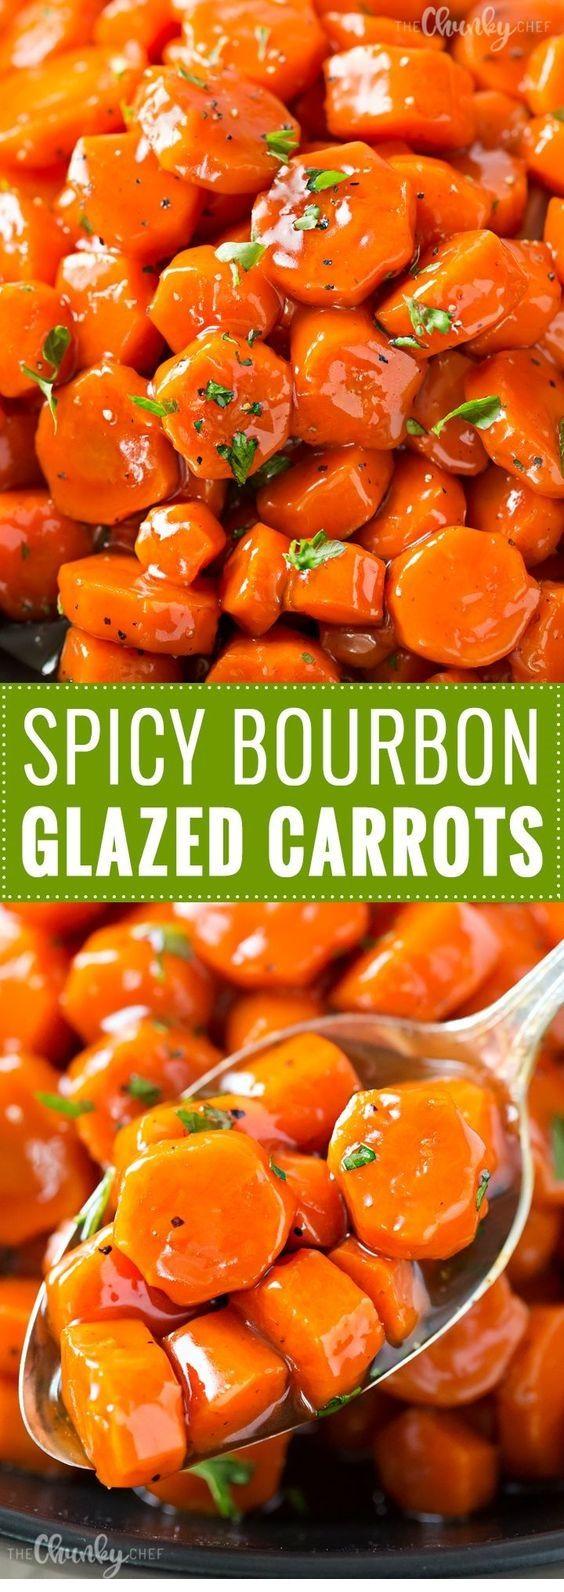 Spicy Bourbon Glazed Carrots   #thanksgivingrecipes